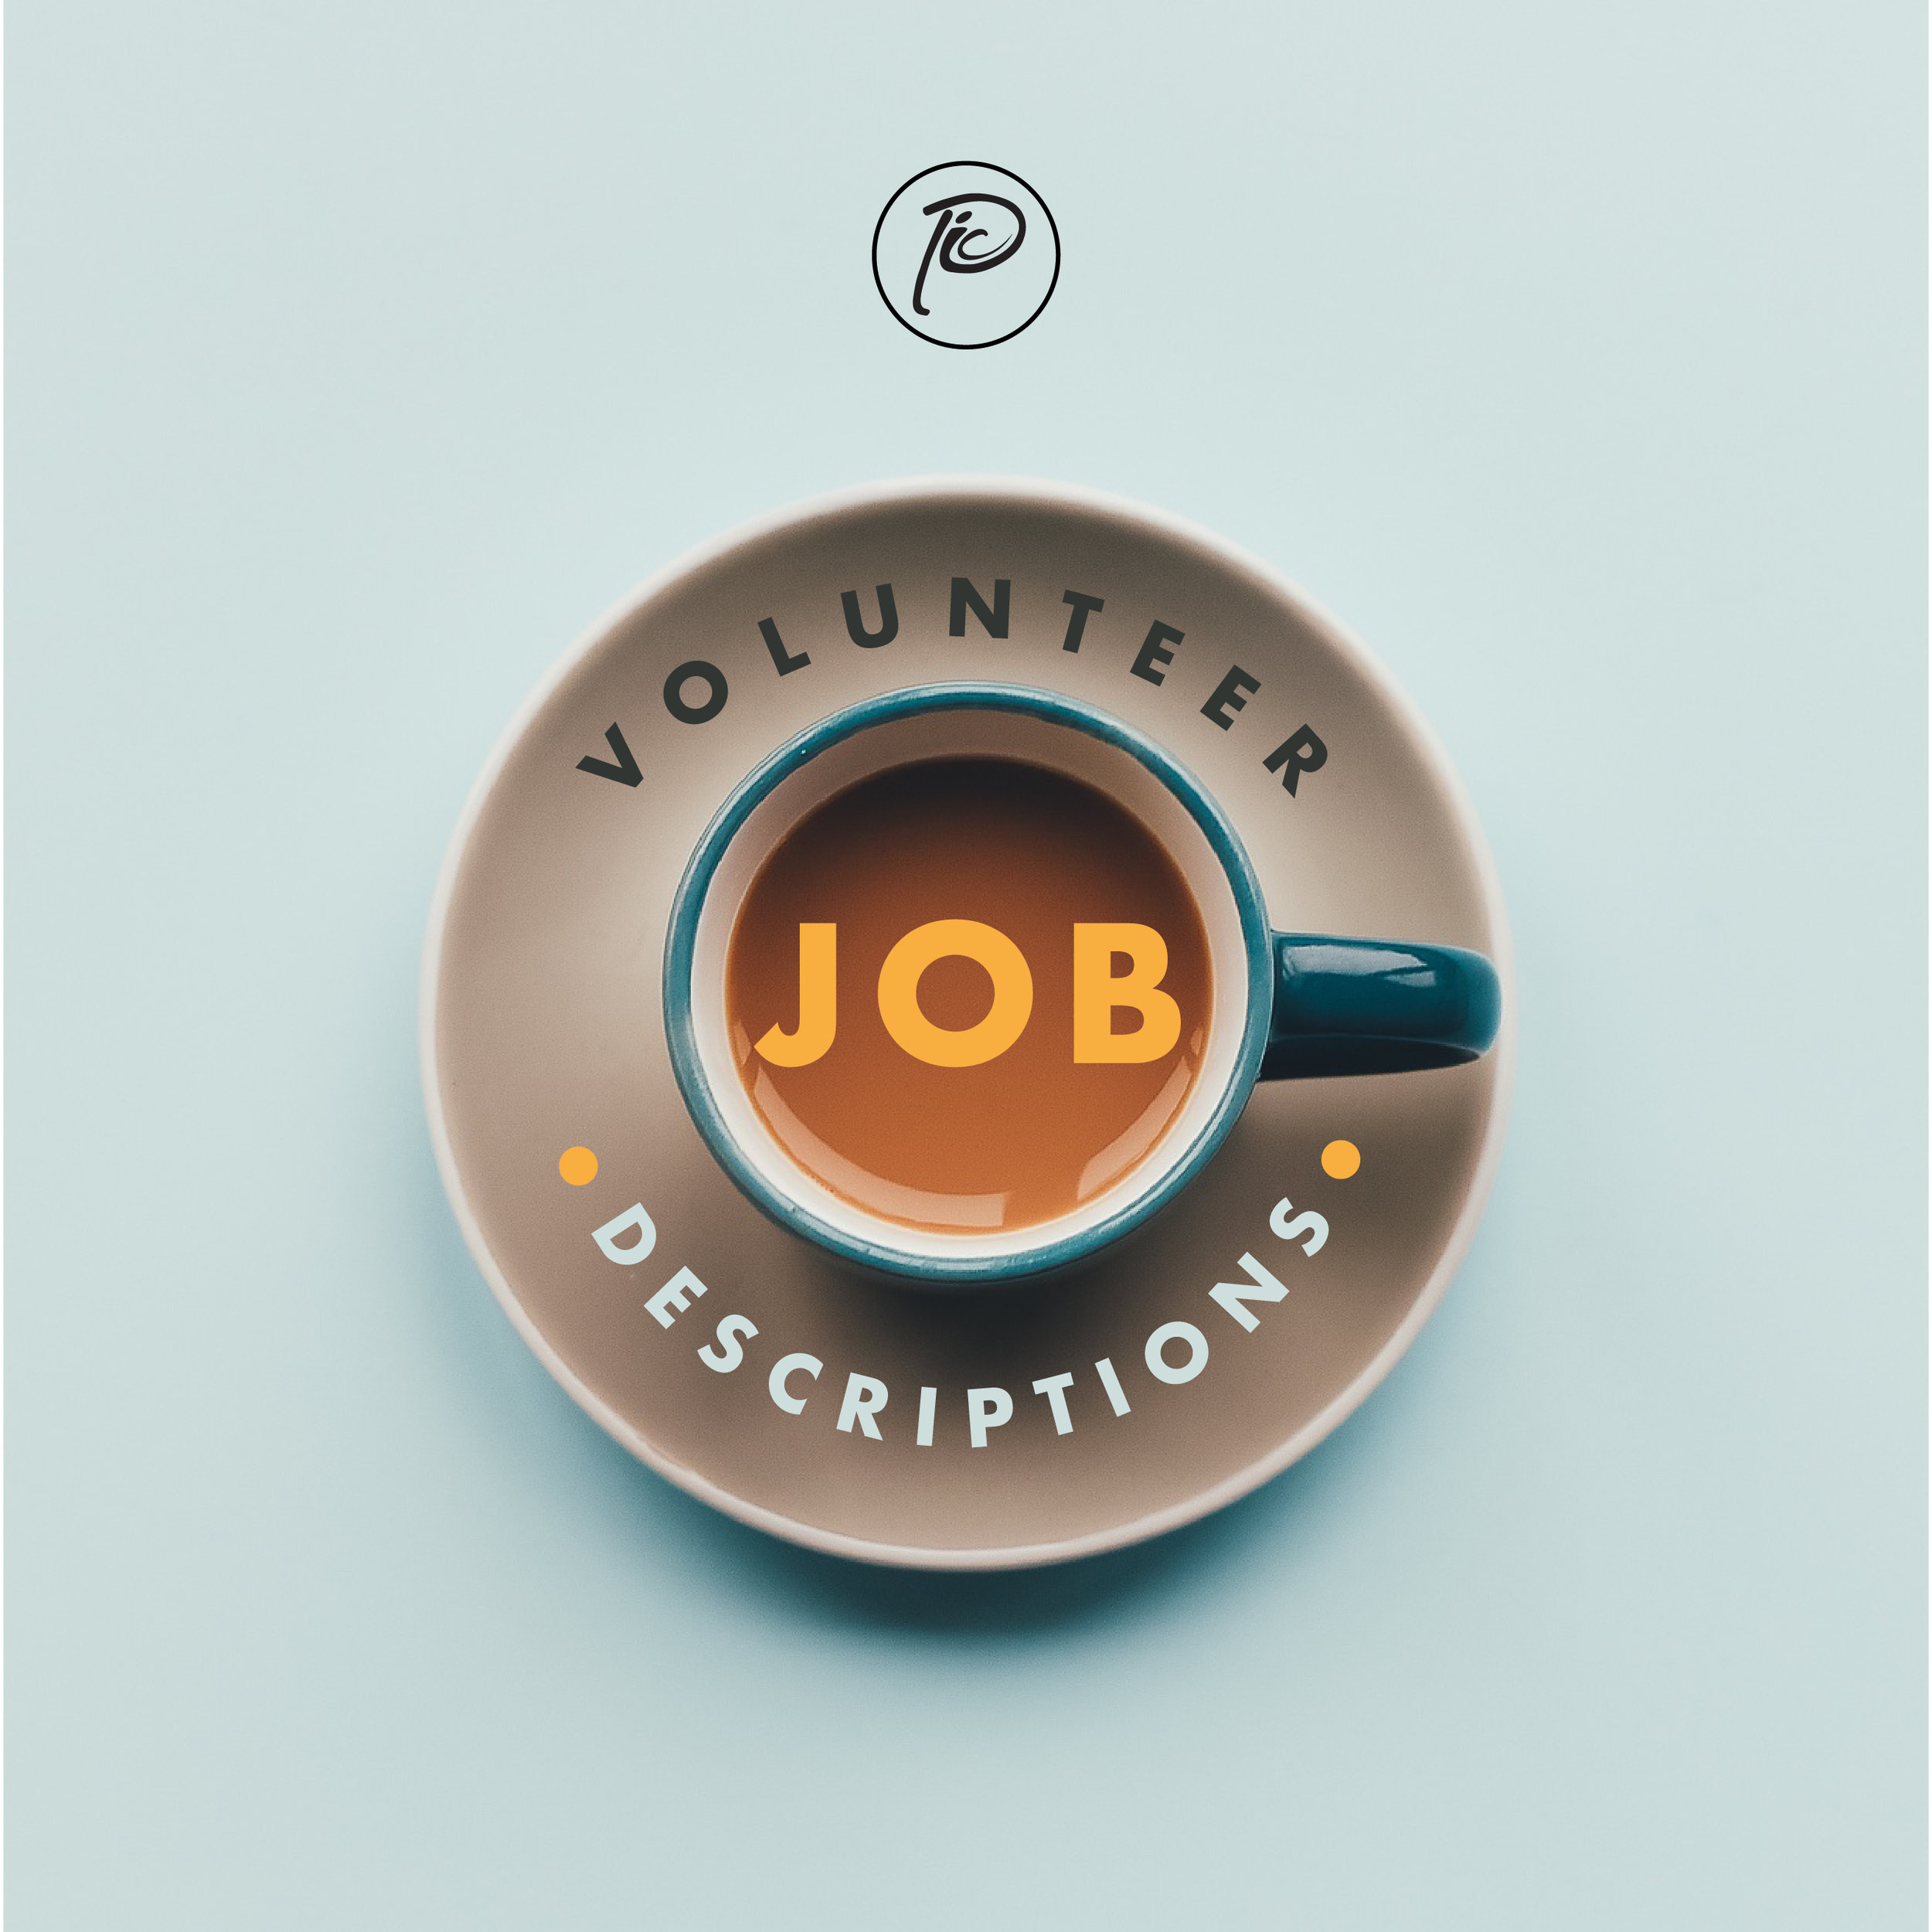 Cover art for a volunteer descriptions booklet